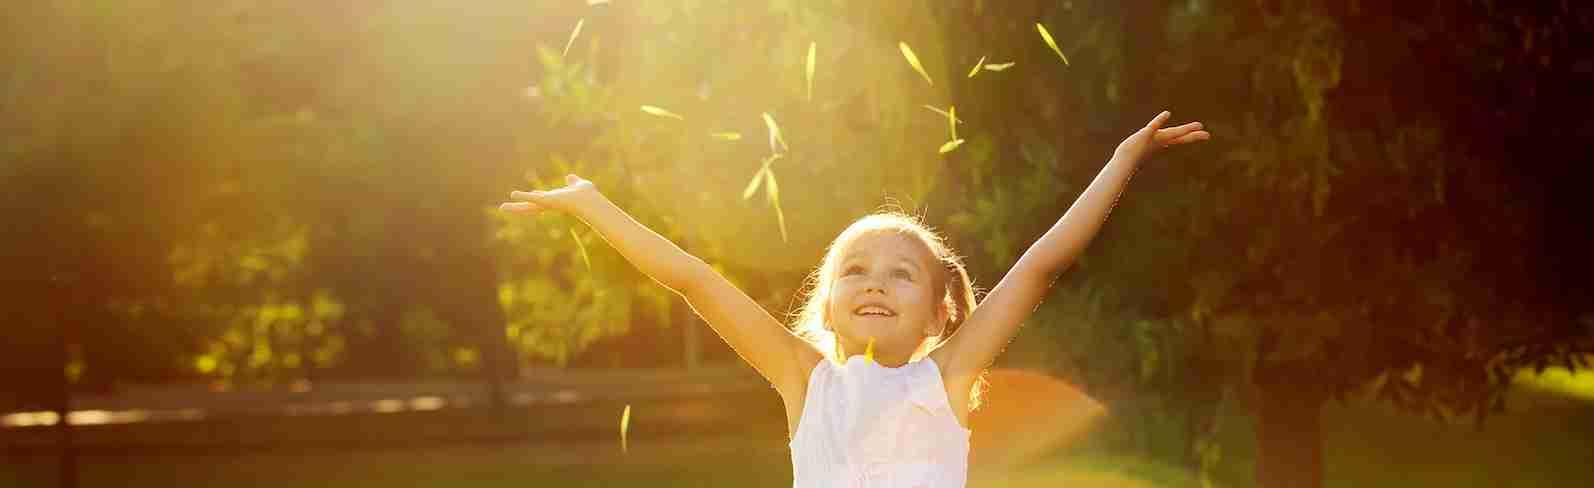 Case Study: Daughter of teacher sees breakthrough!